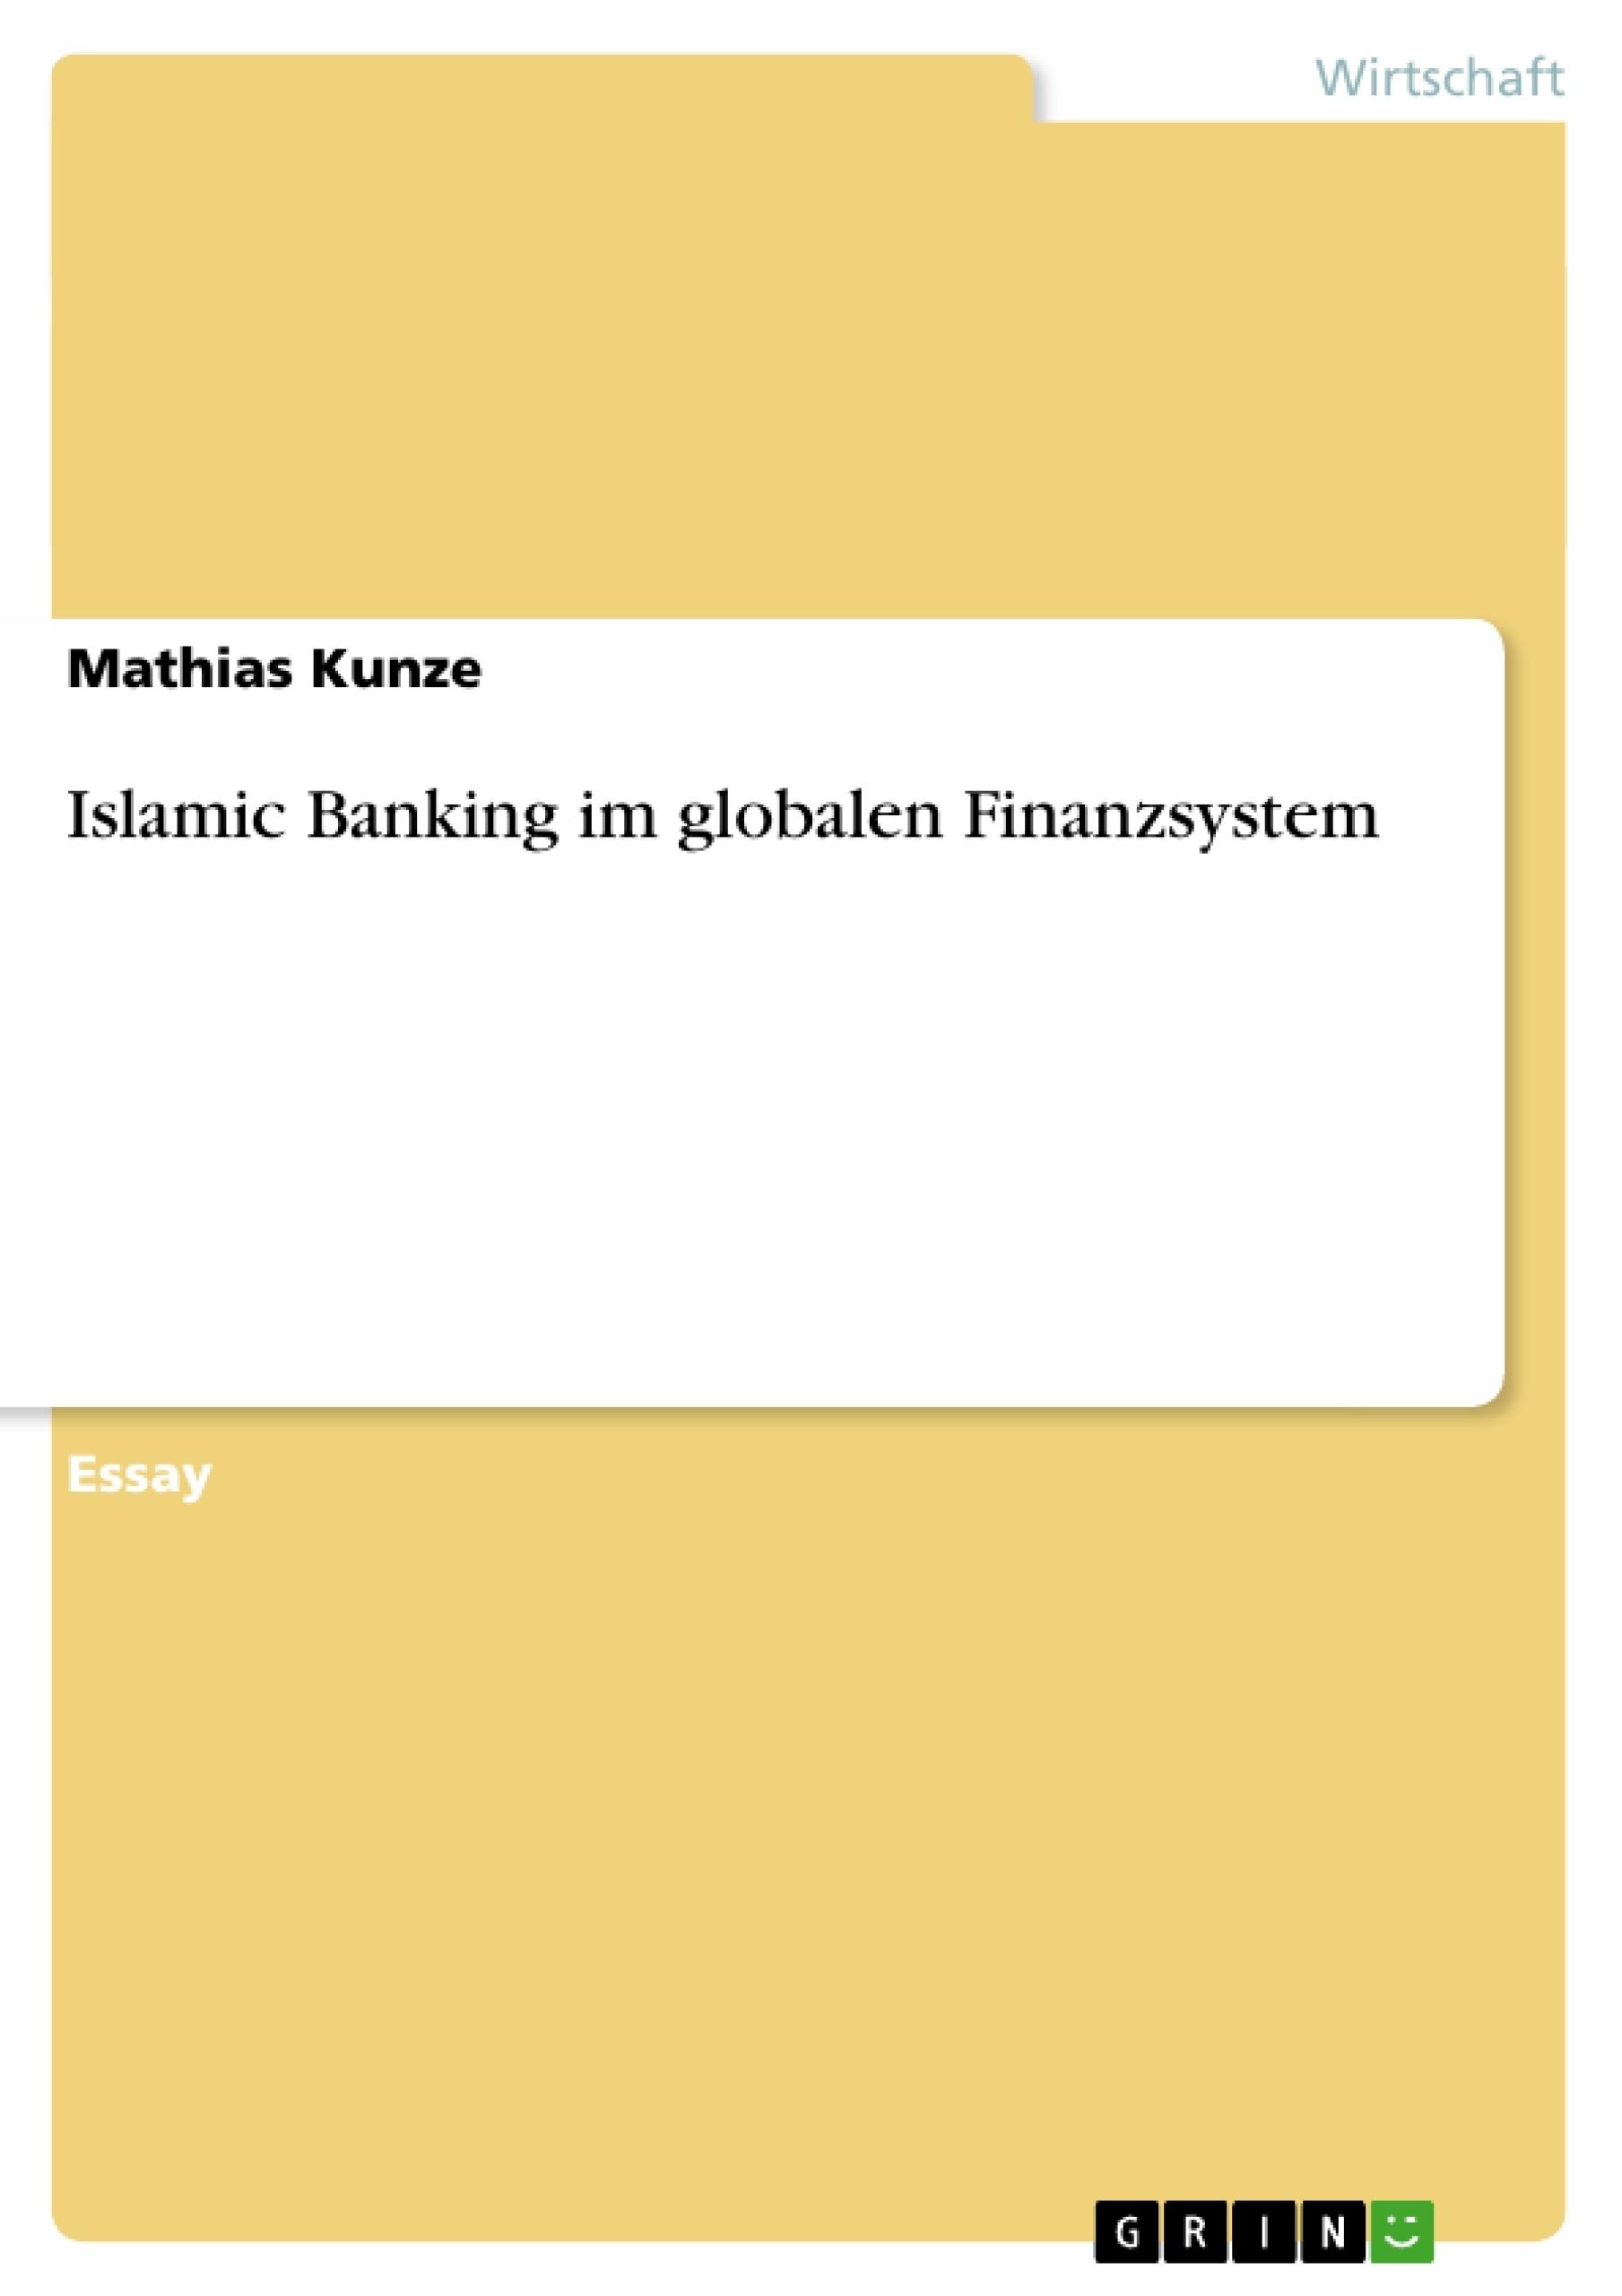 Titel: Islamic Banking im globalen Finanzsystem